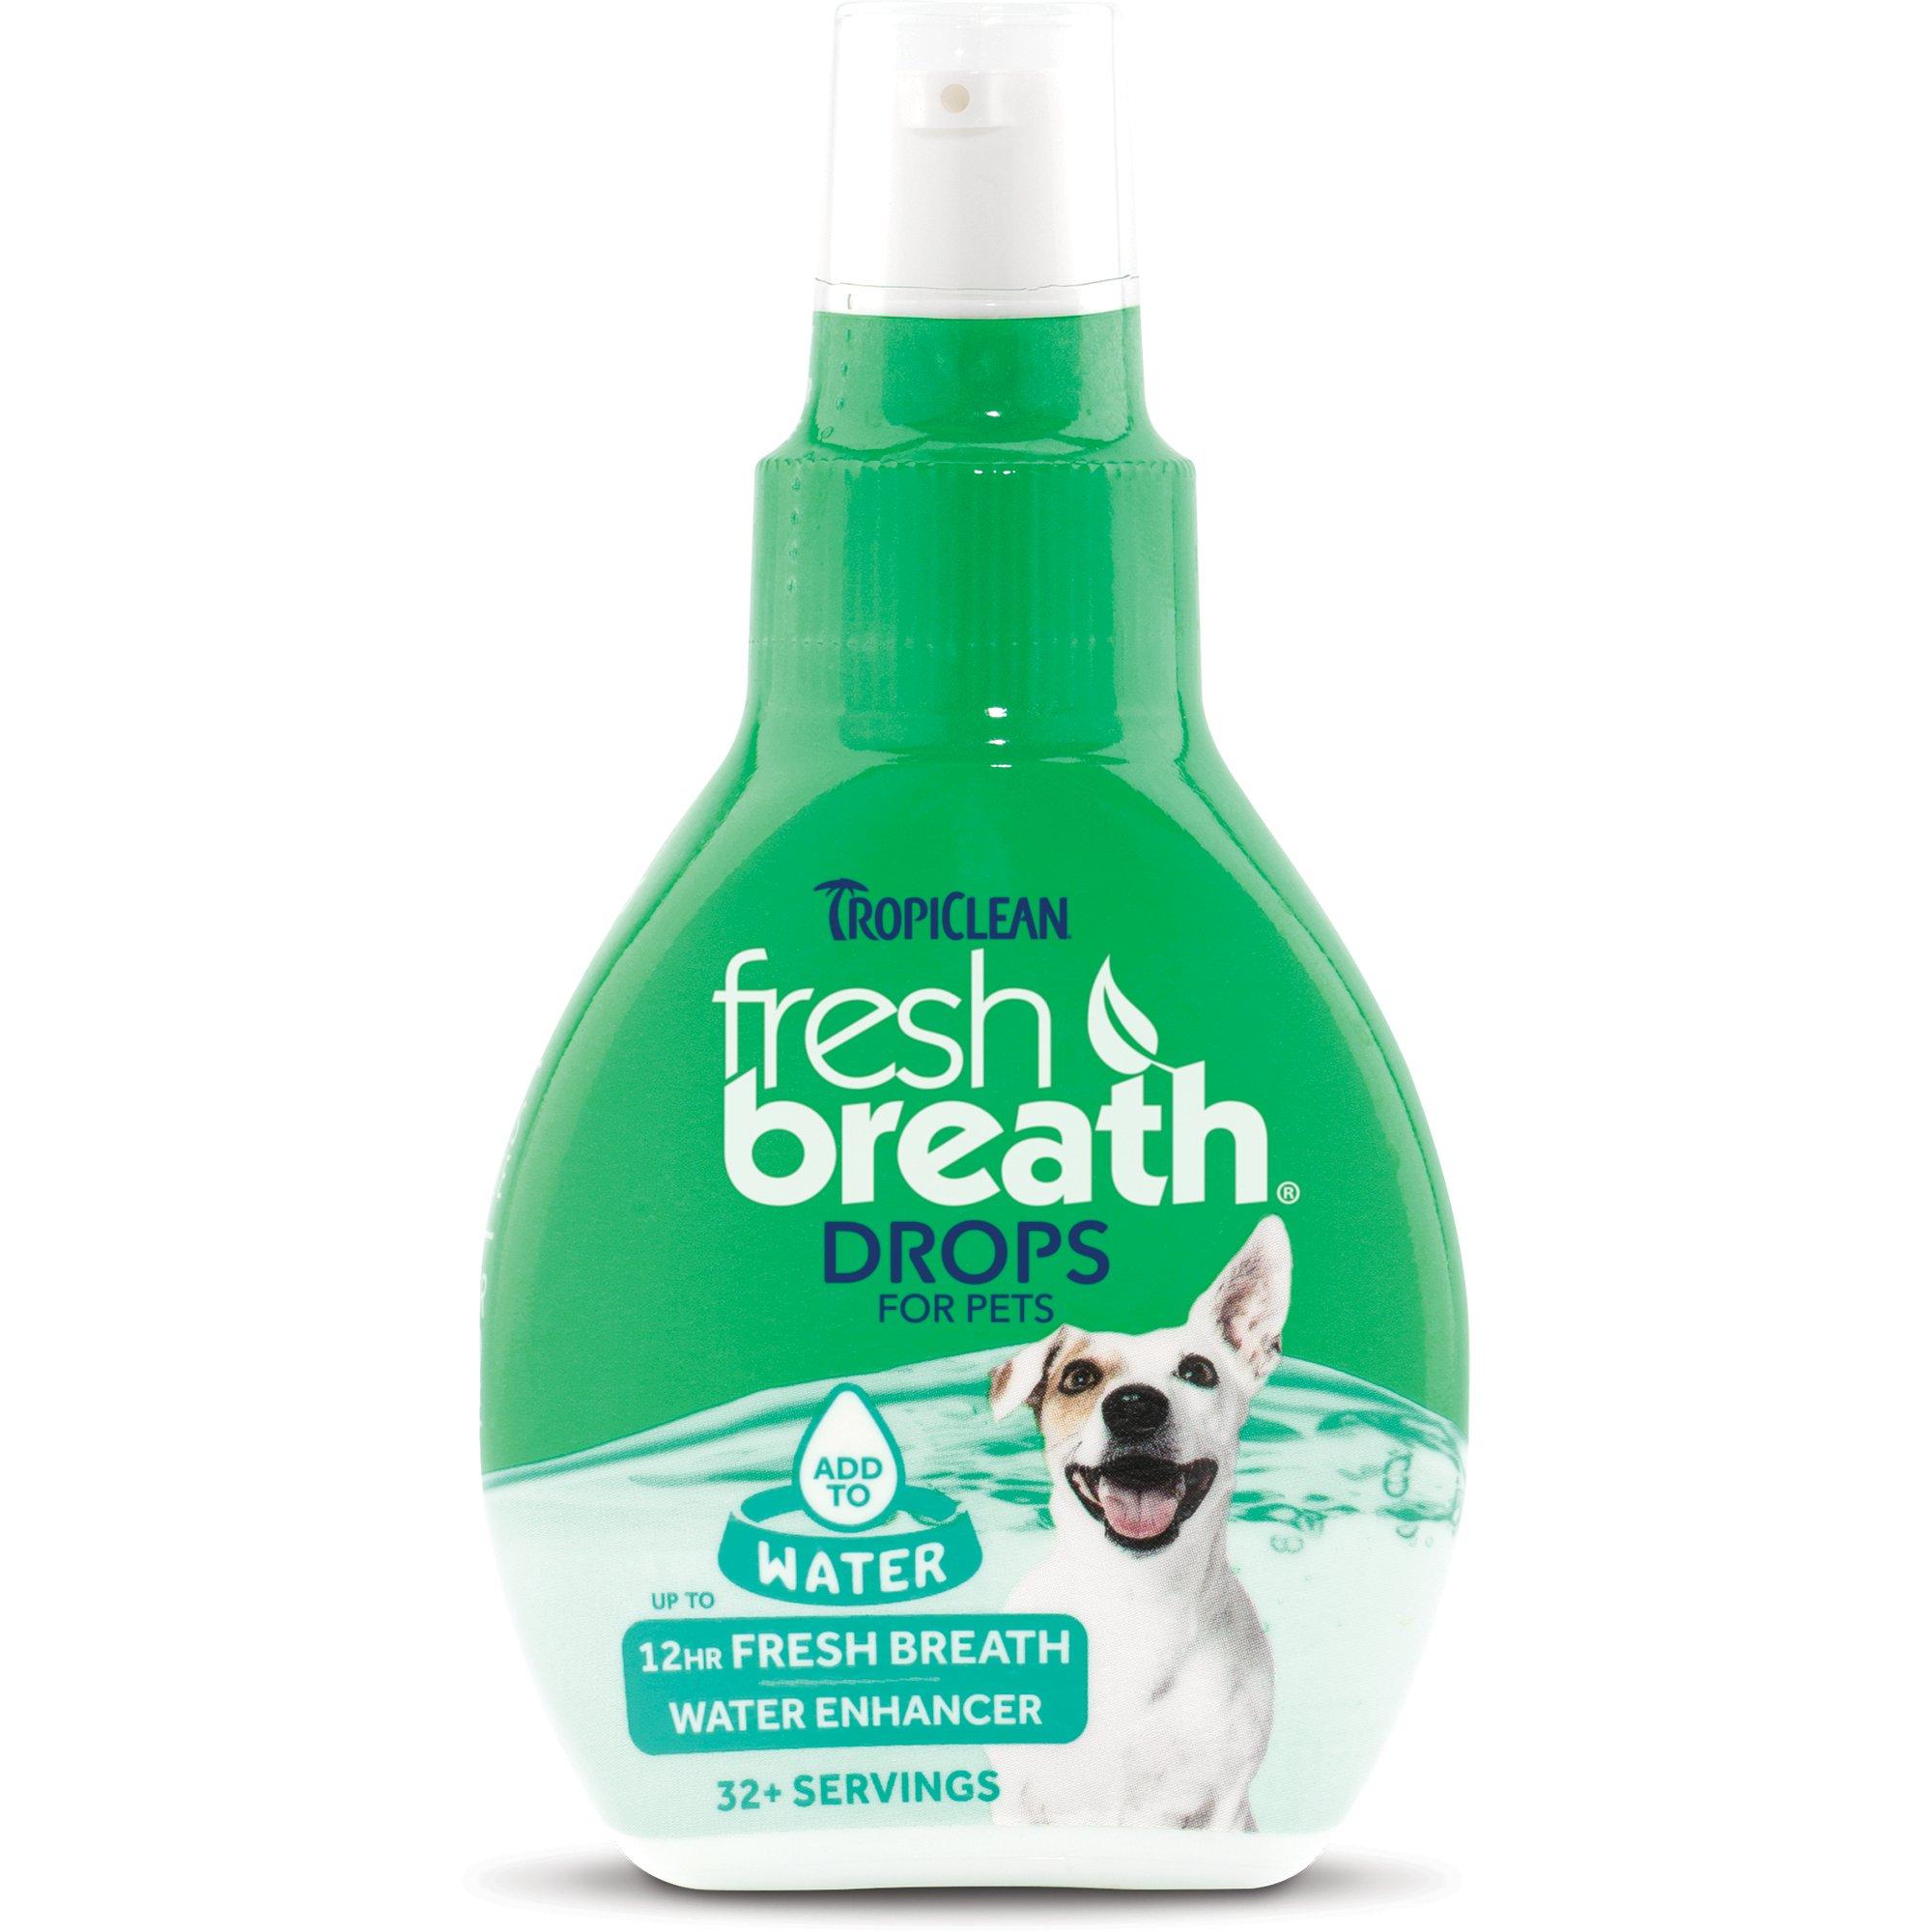 Tropiclean Fresh Breath Pet Water Enhancer Drops Petco